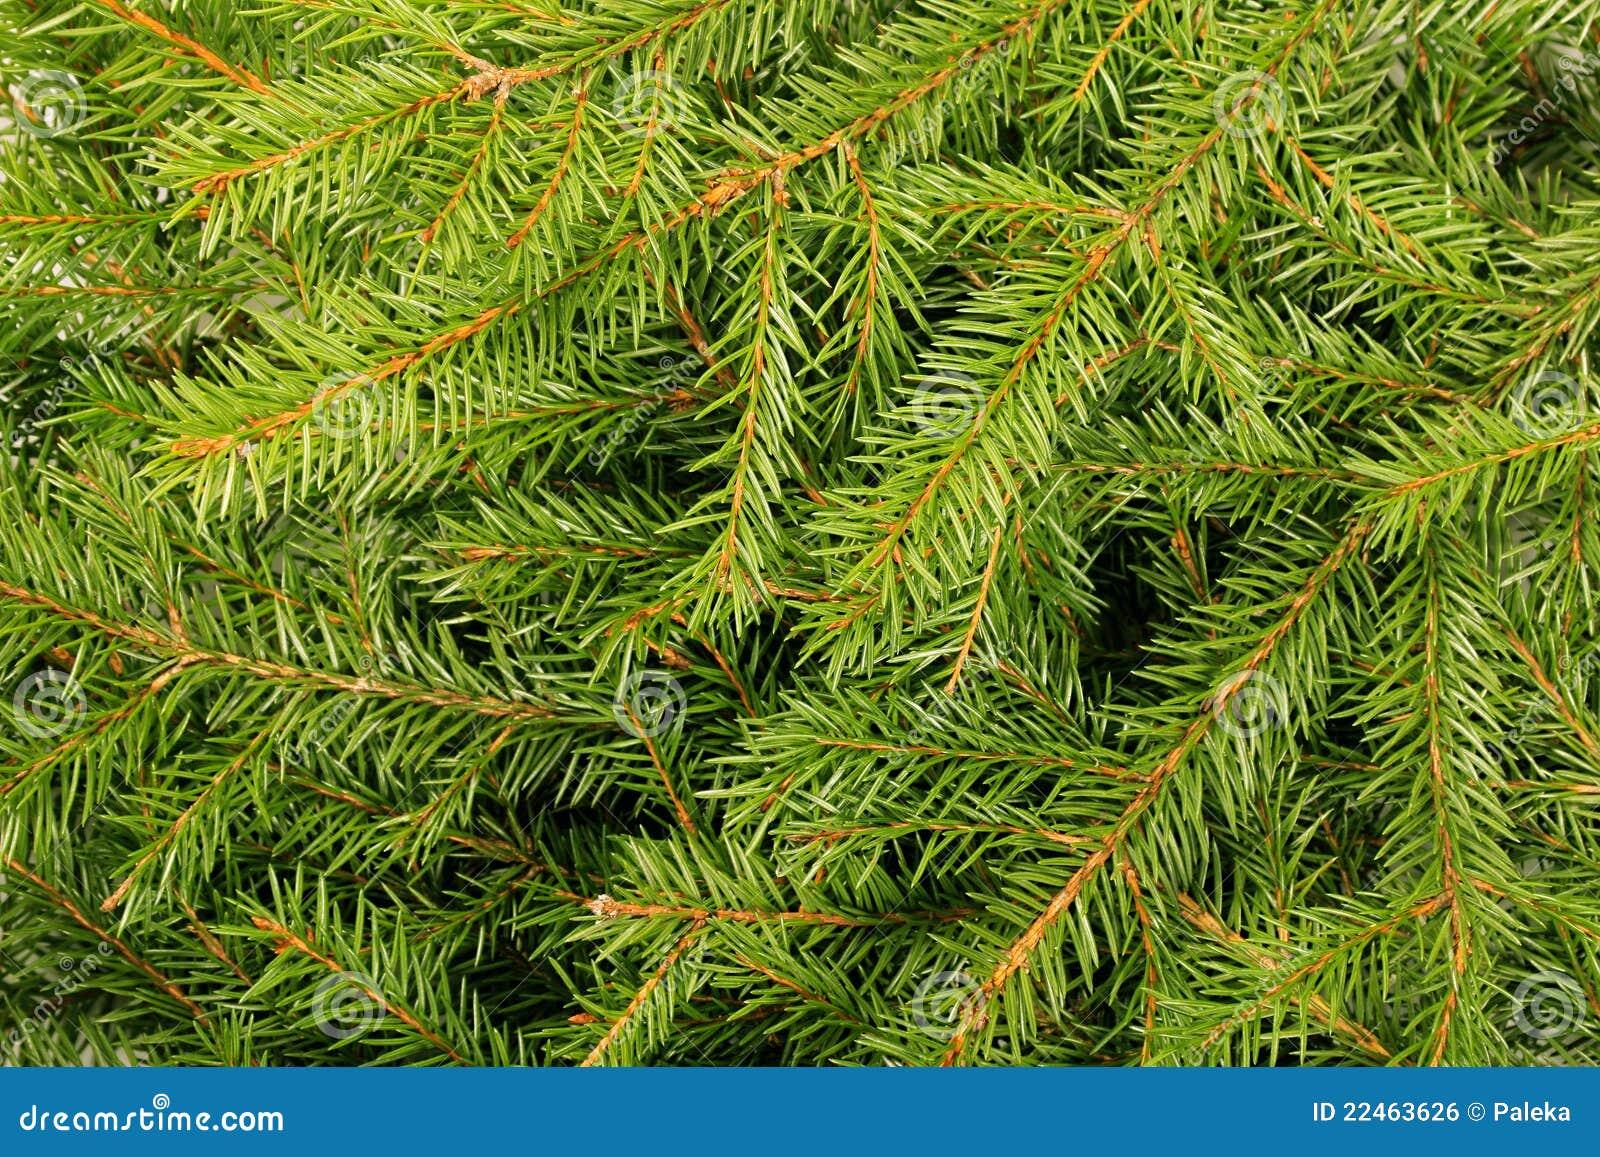 Pine Tree Allergy | Causes, Symptoms & Treatment | ACAAI ...